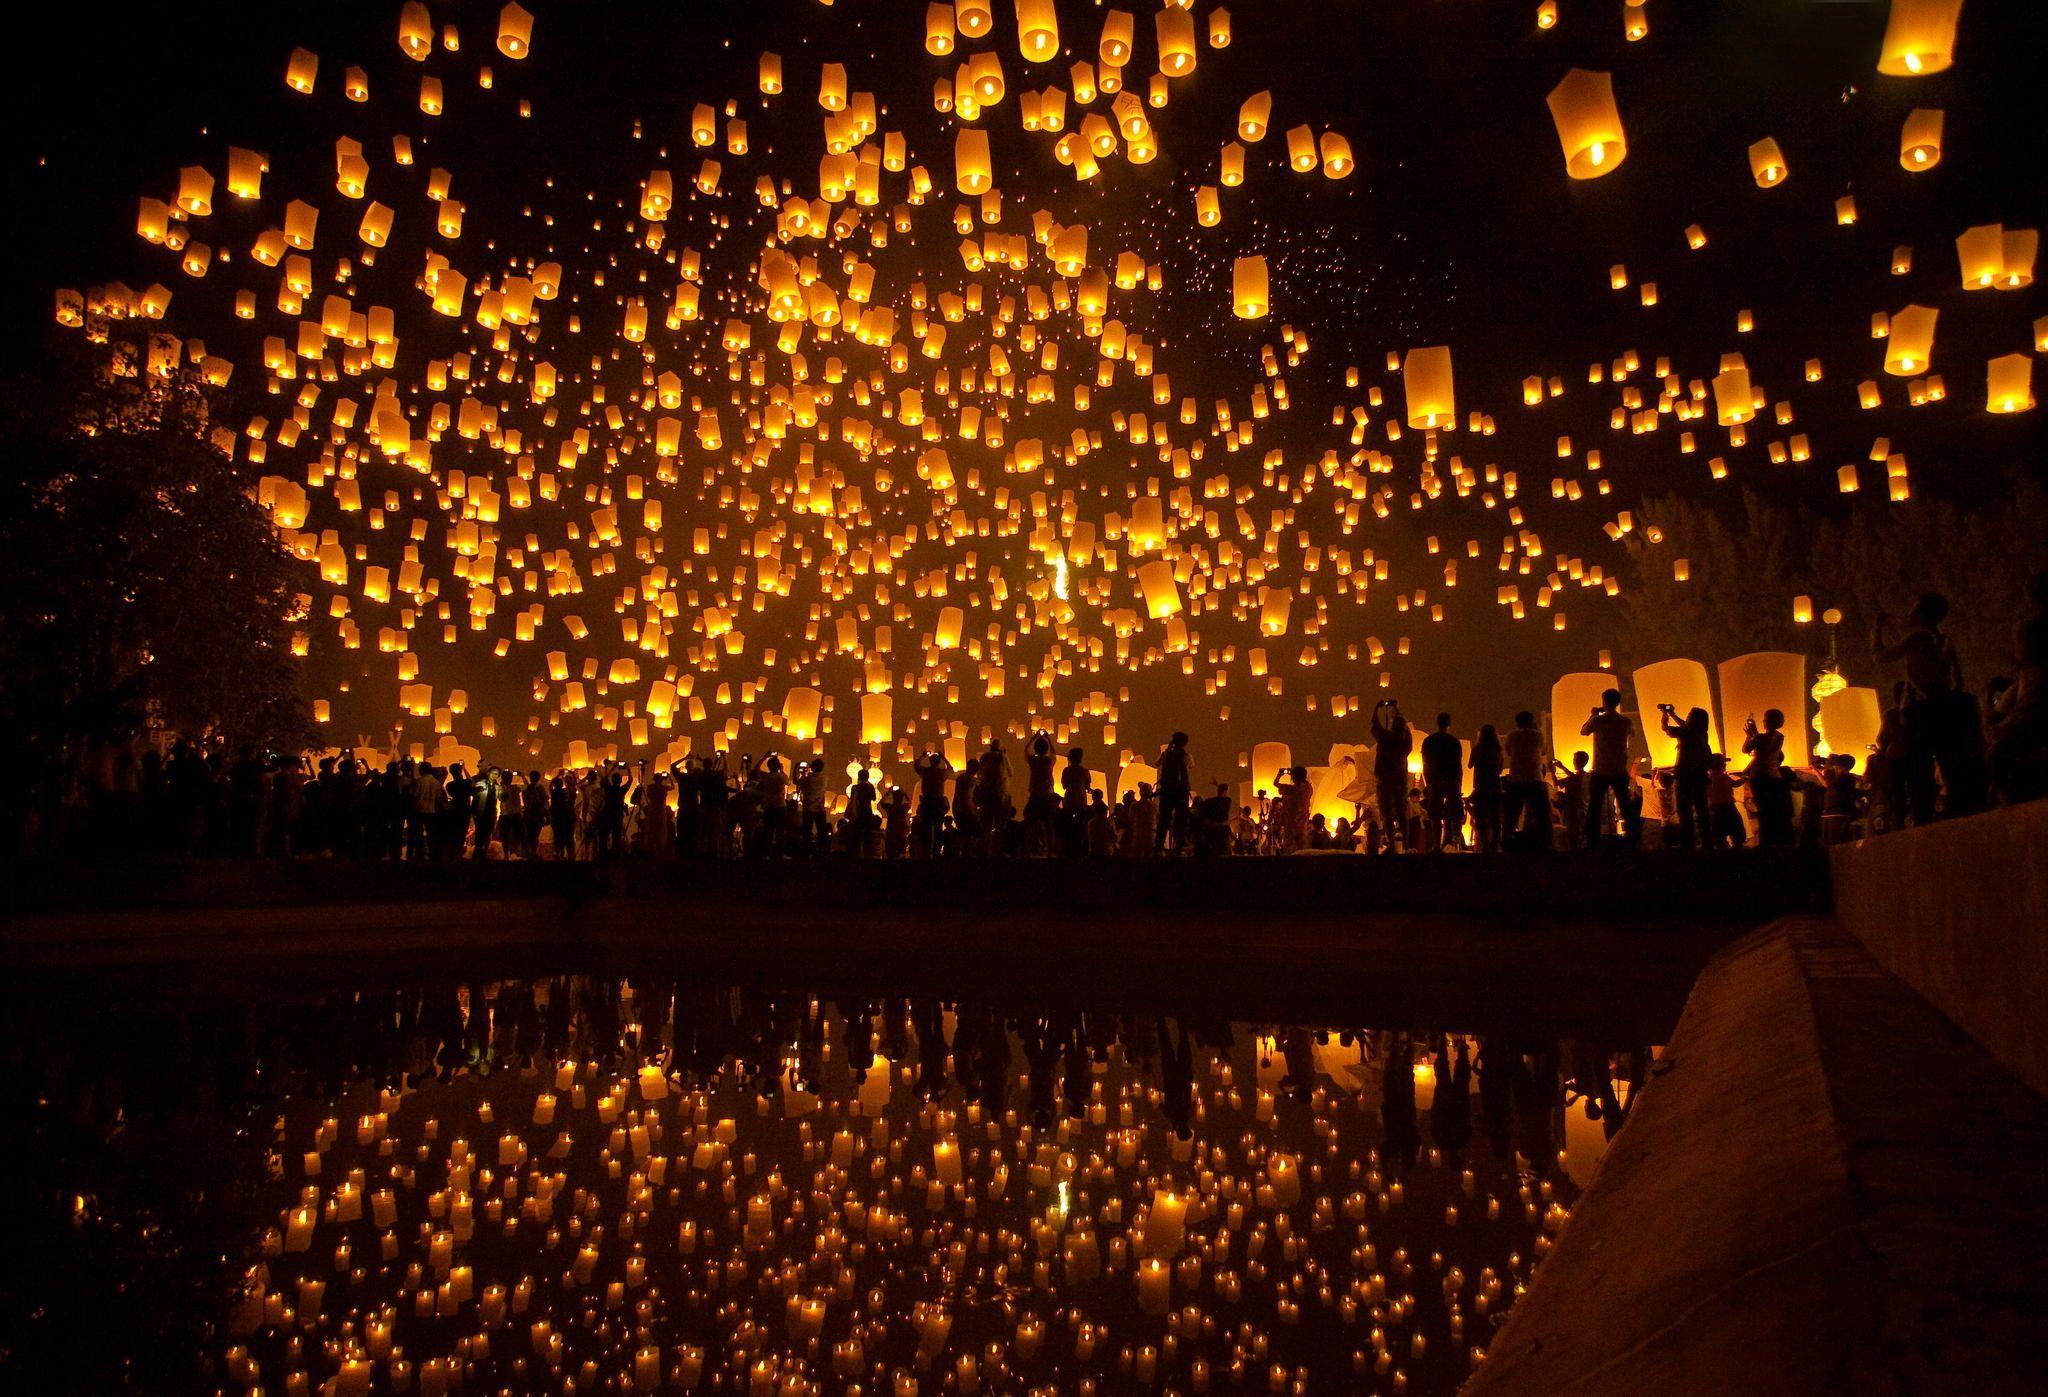 Lantern Festival Wallpapers Top Free Lantern Festival Backgrounds Wallpaperaccess